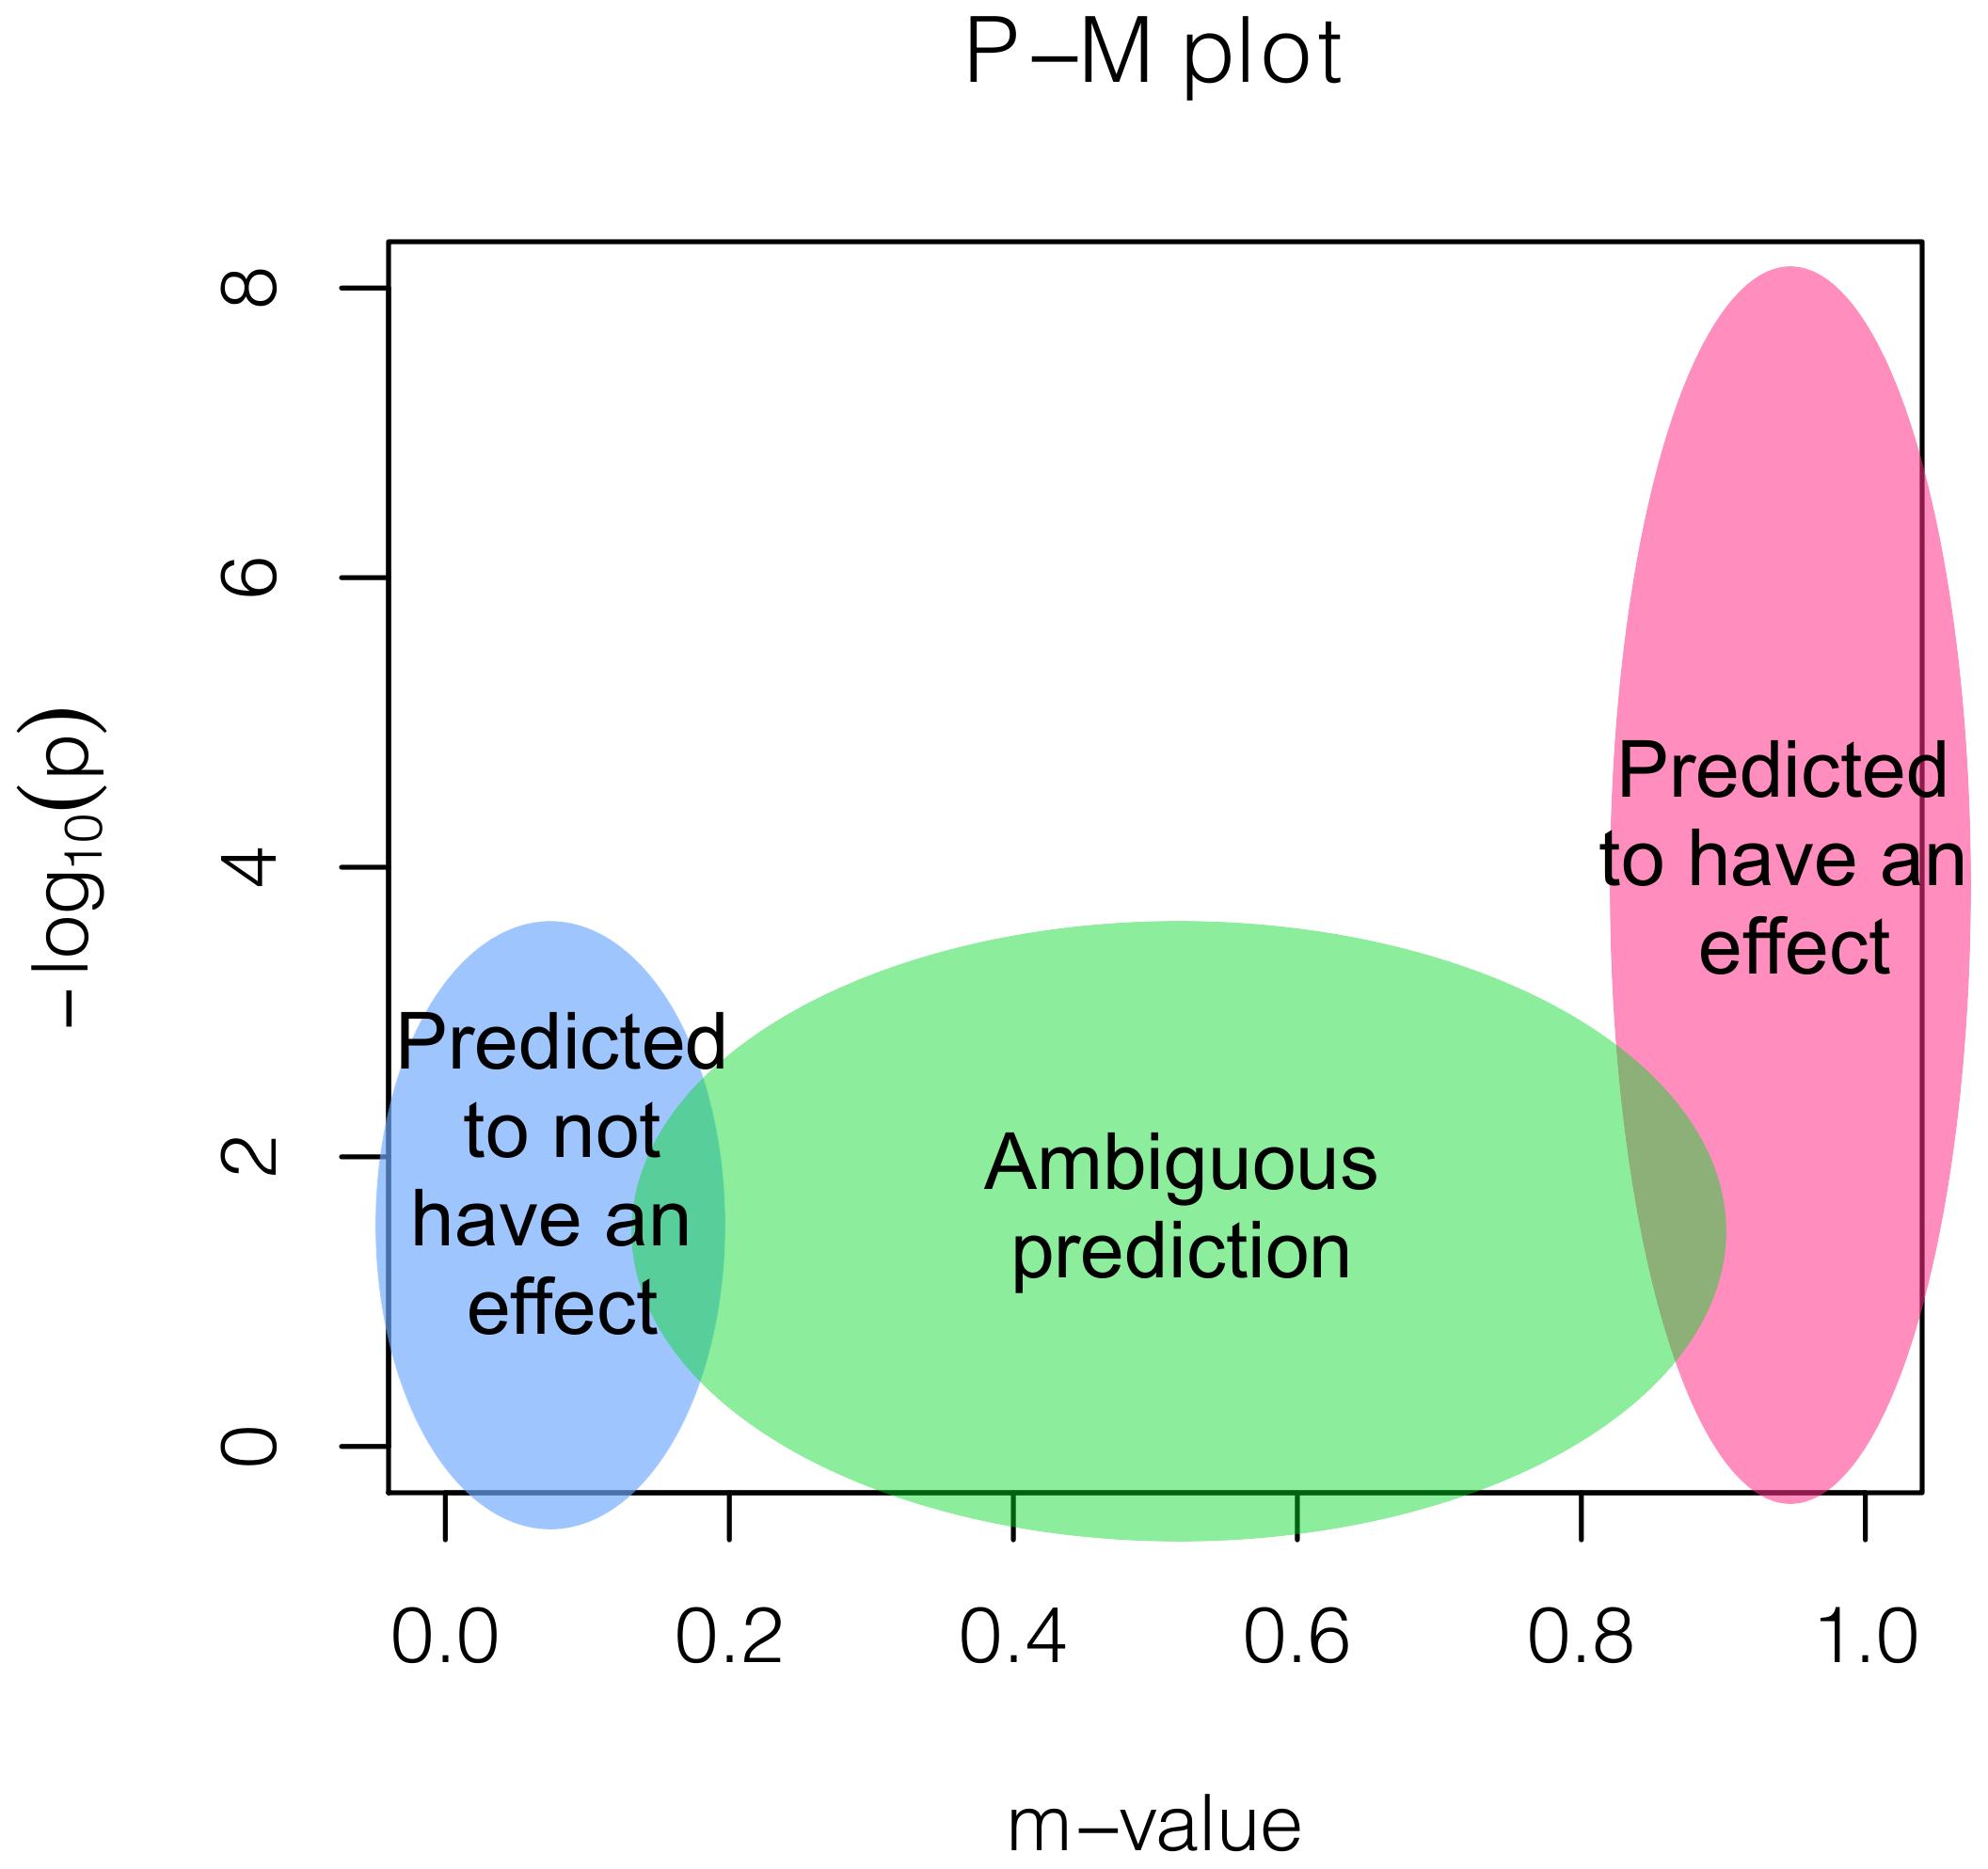 A figure depicting the interpretations based on a P-M plot.